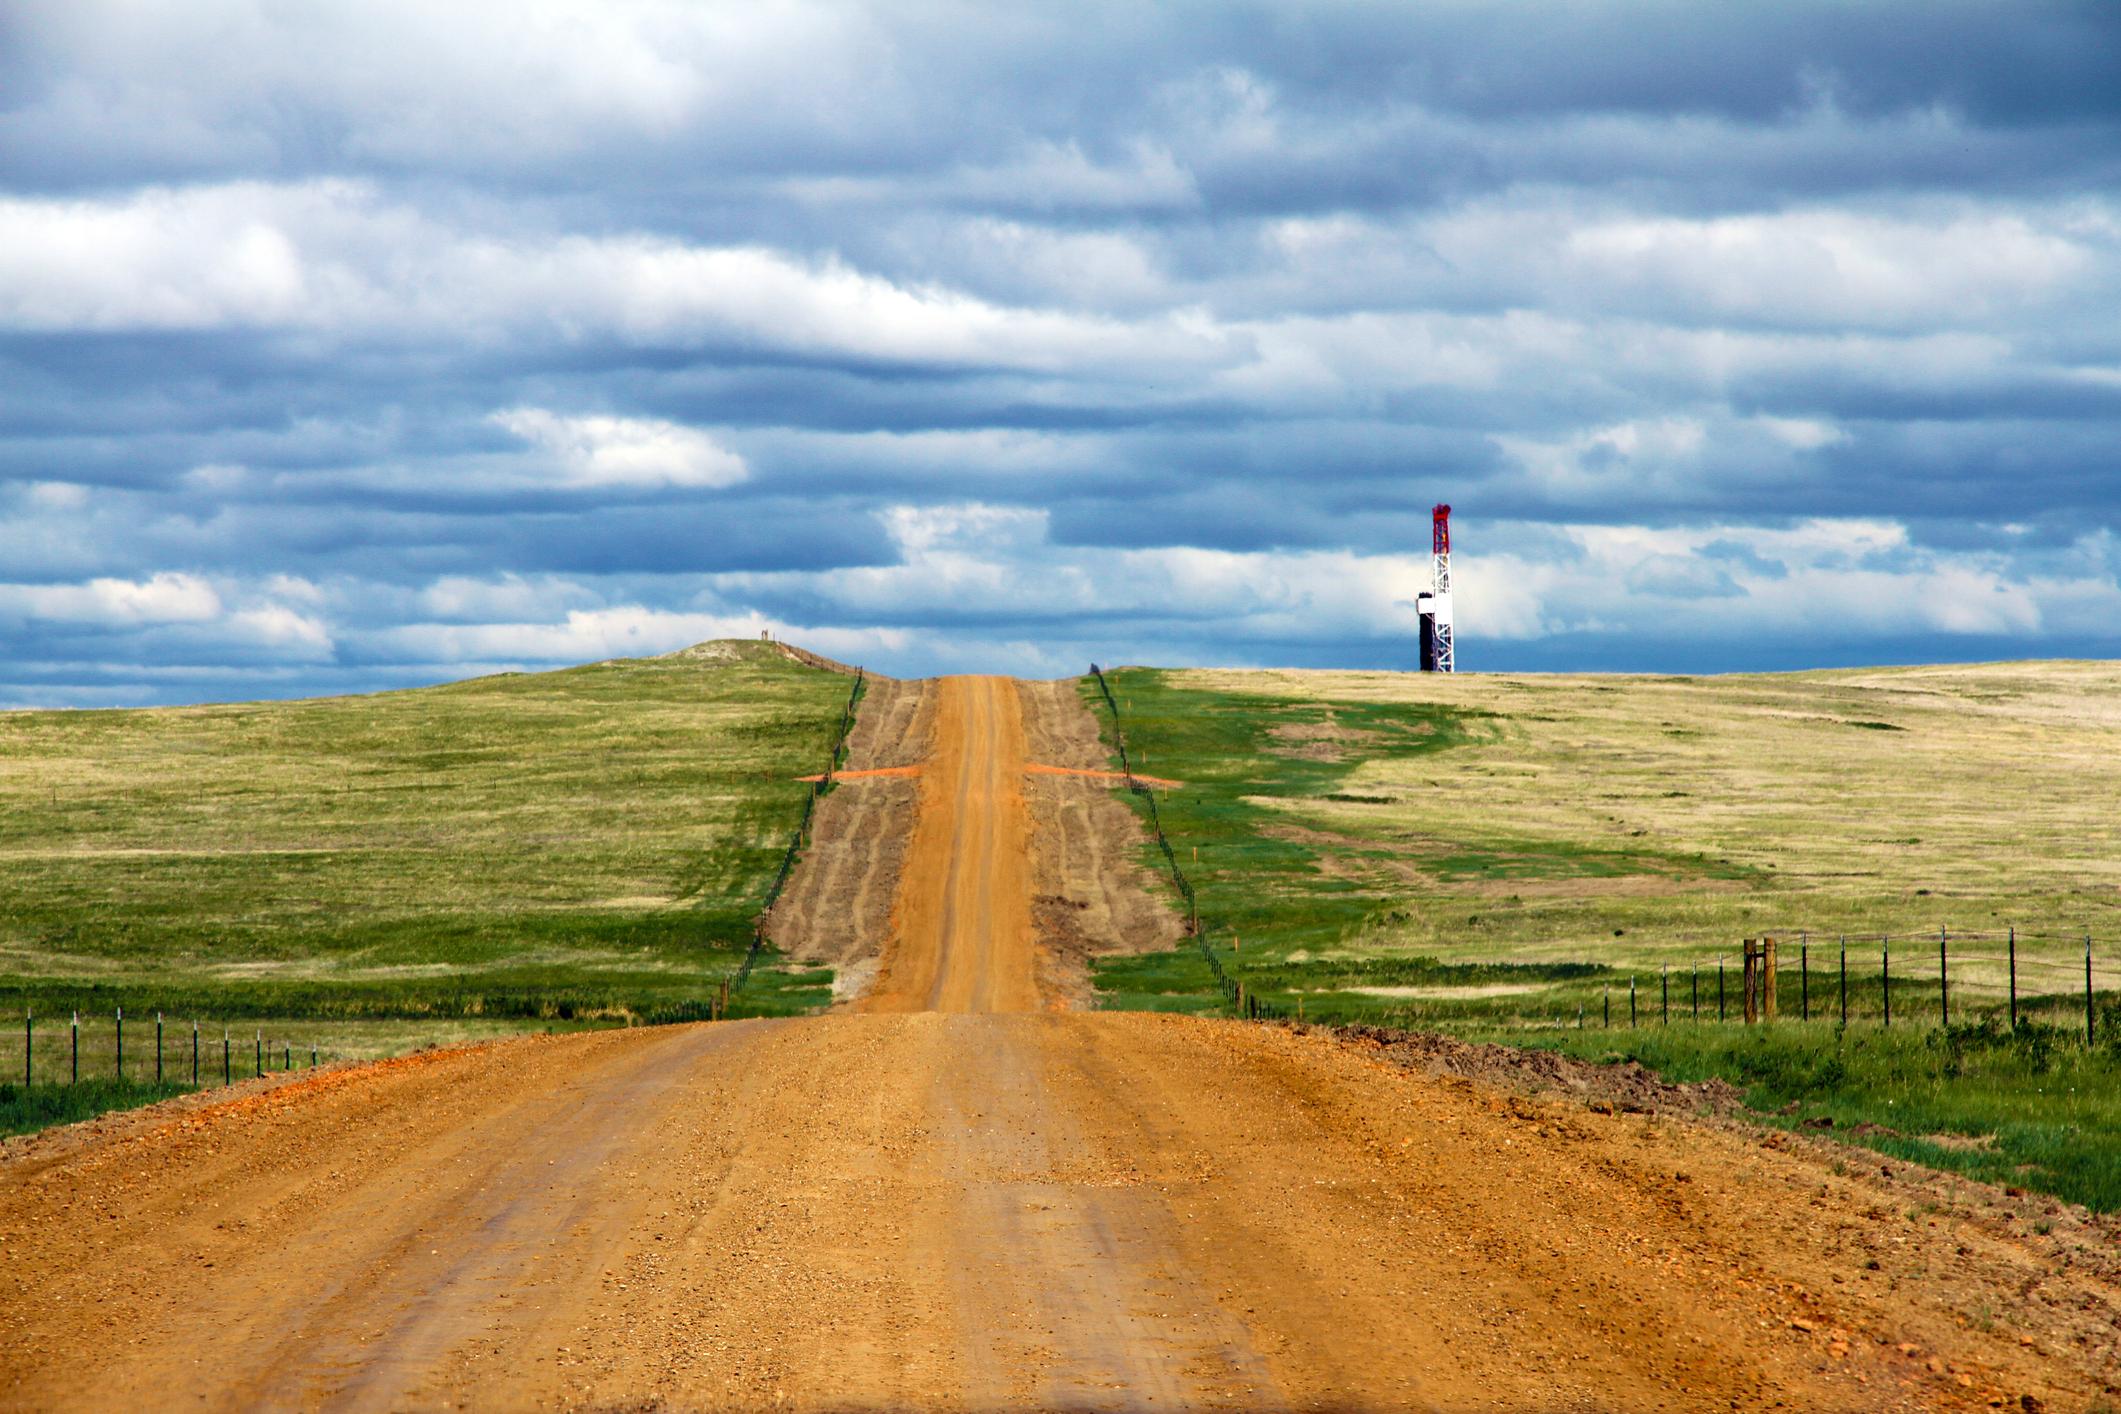 An oil rig down a long dirt road in the Bakken.